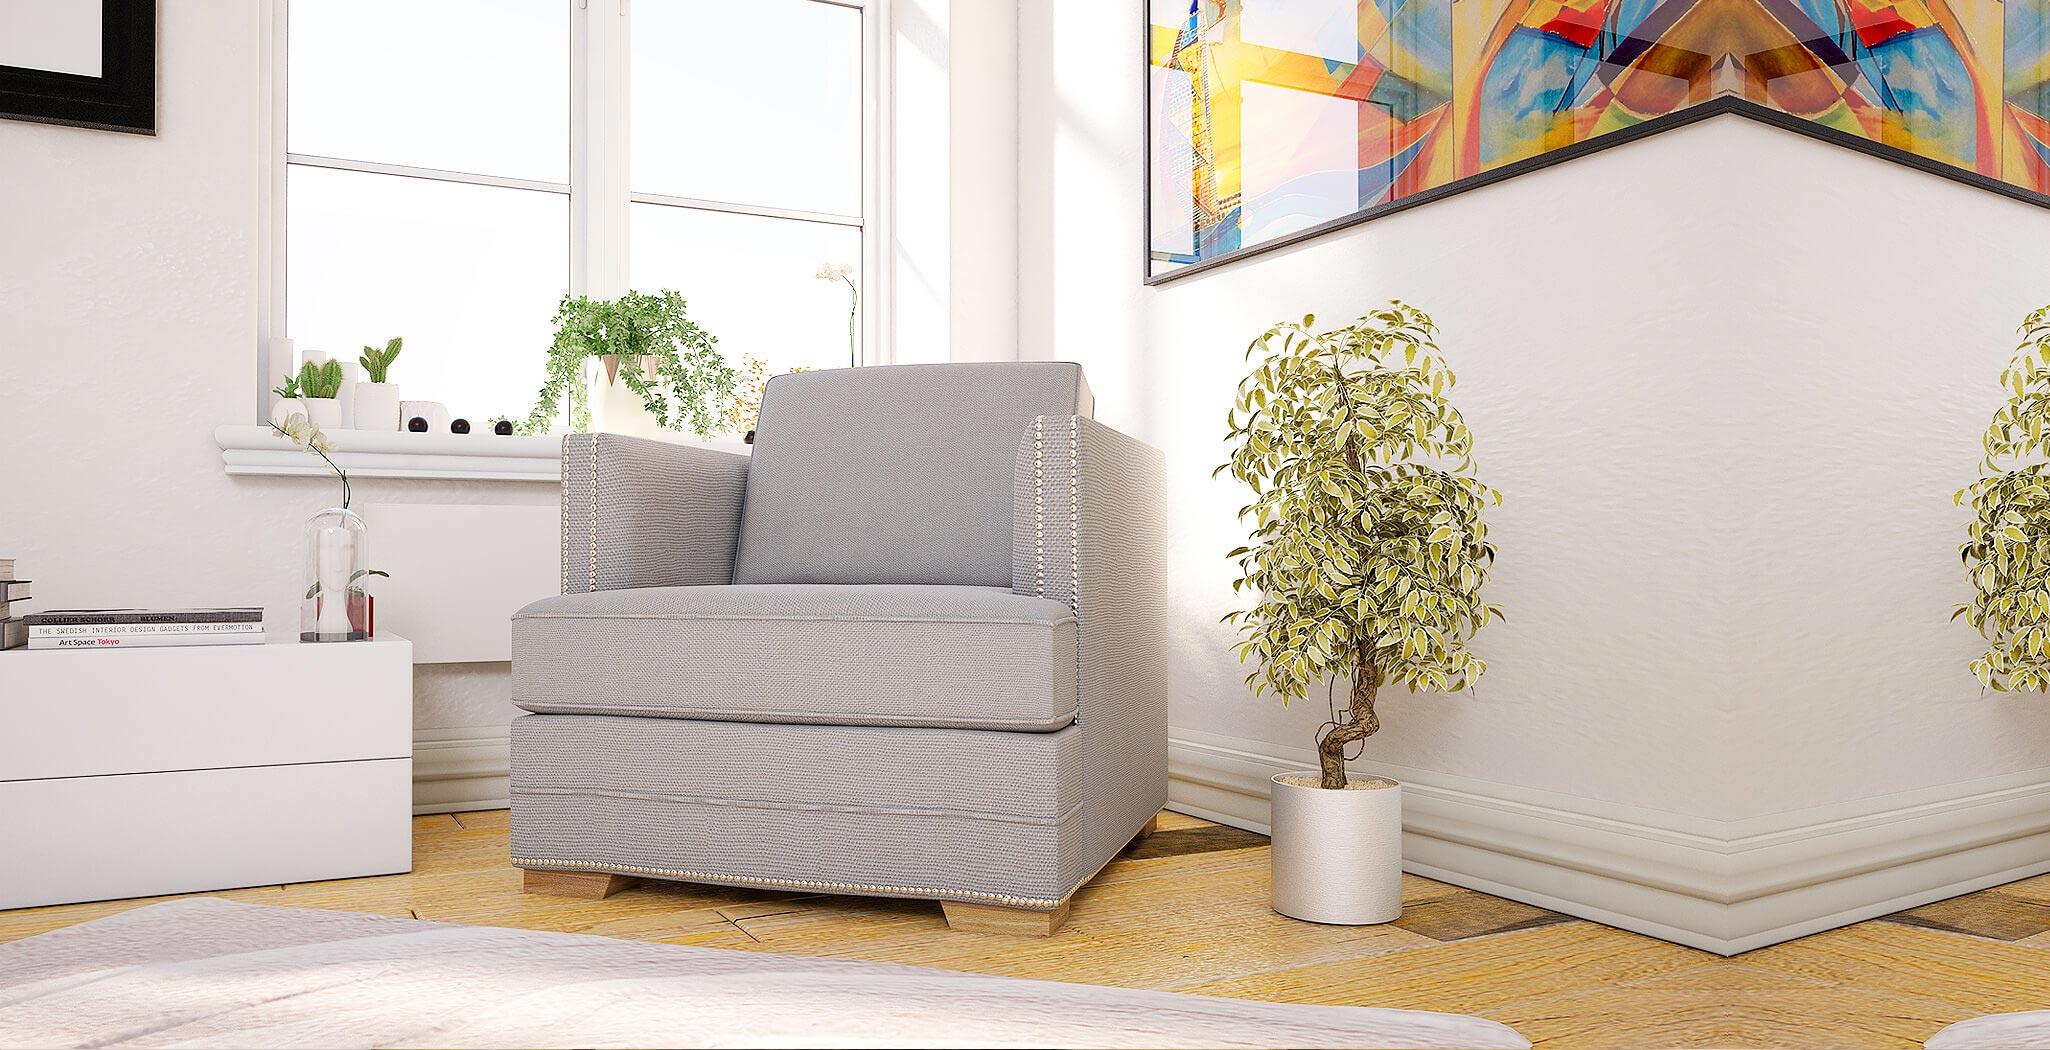 riga chair furniture gallery 2